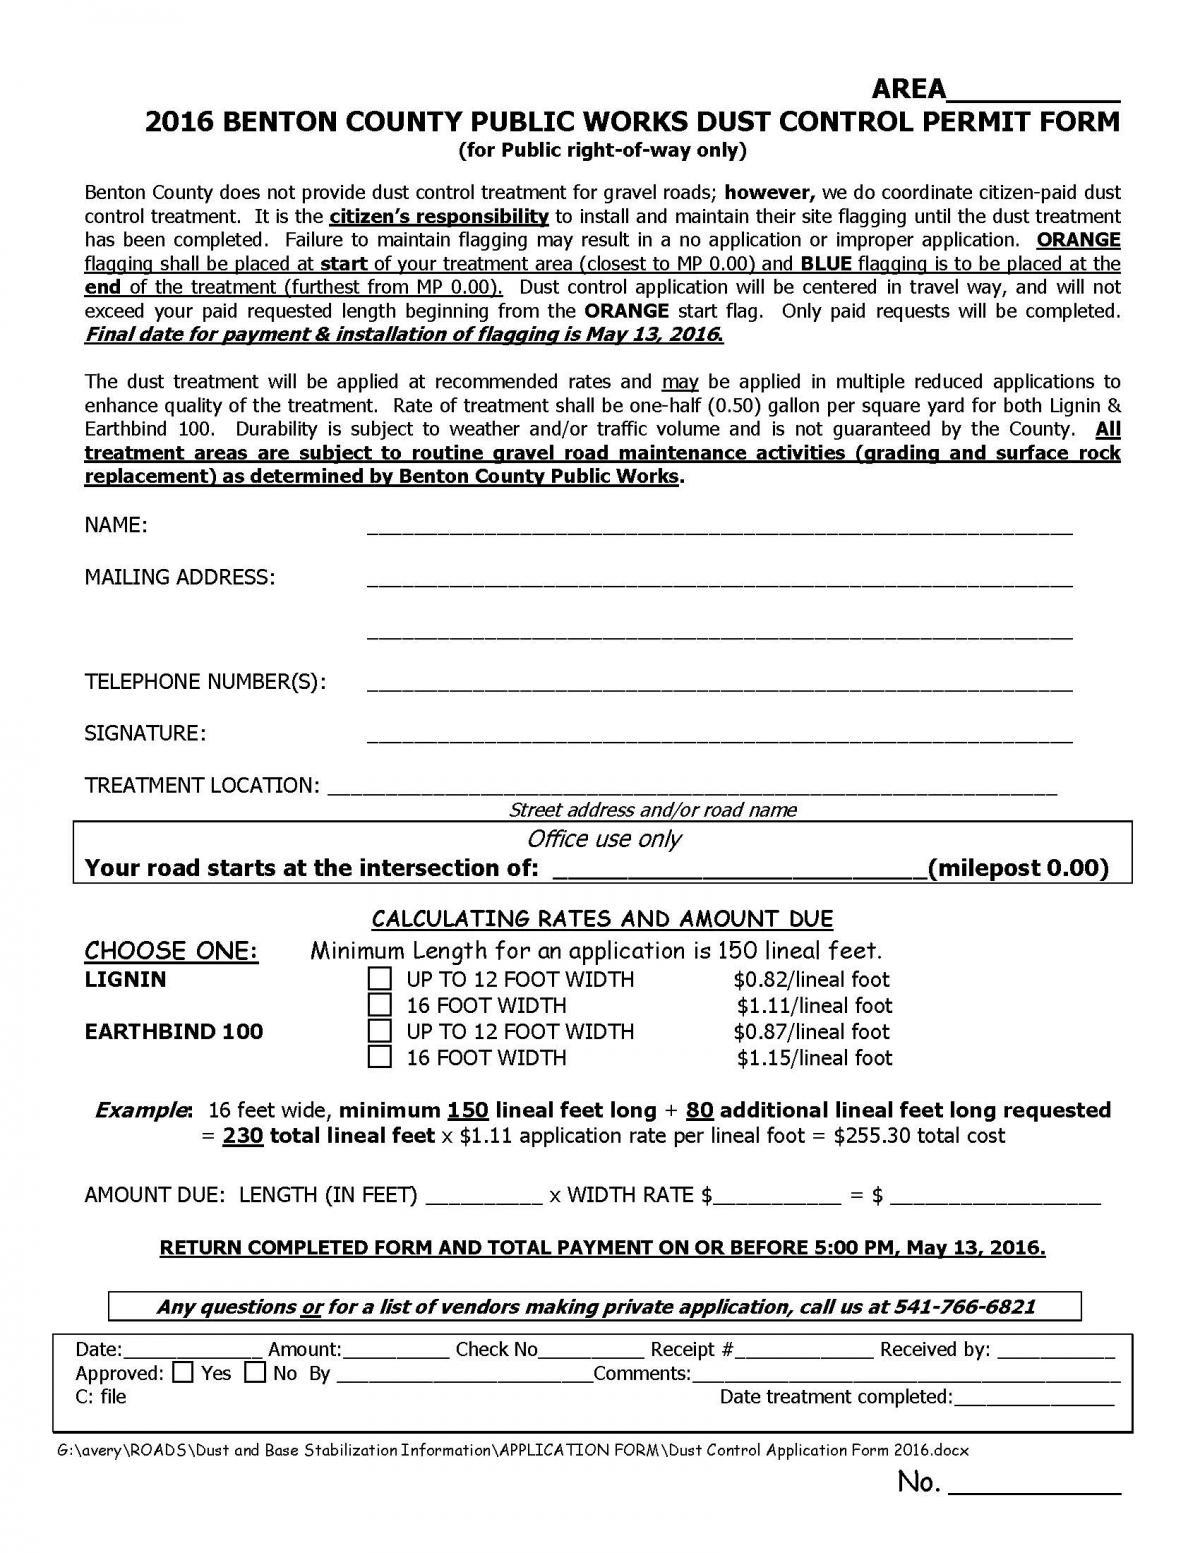 2016 dust control application form benton county oregon 2016 dust control application aiddatafo Gallery